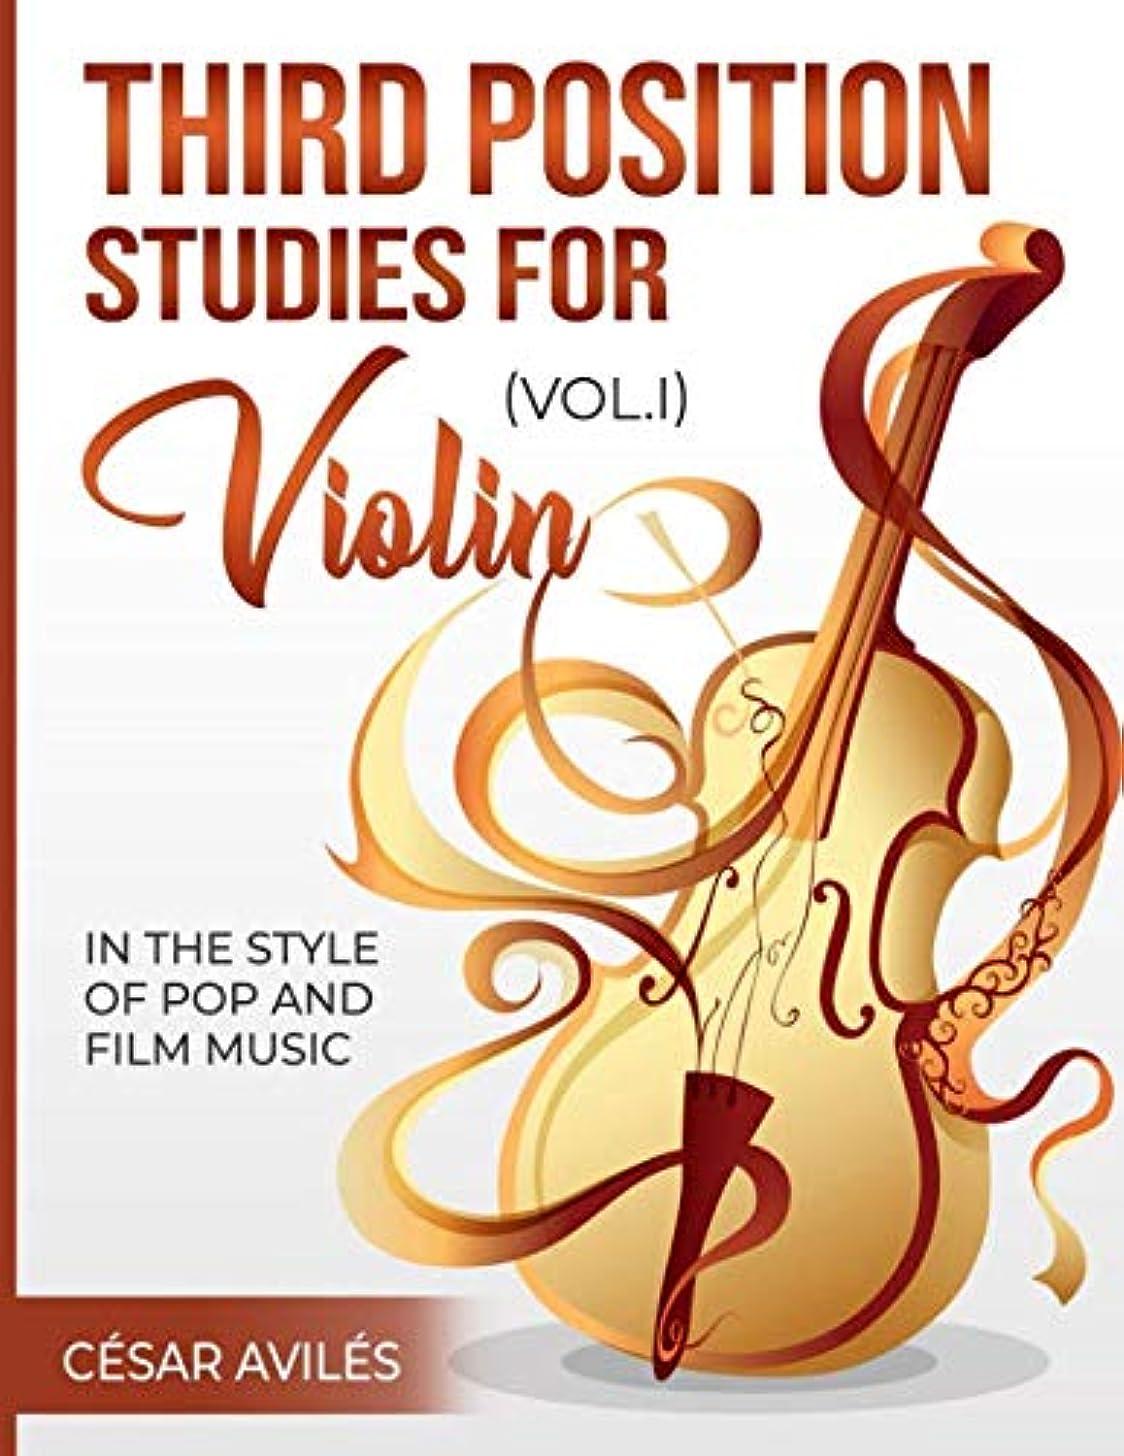 Third Position Studies for Violin, Vol, I